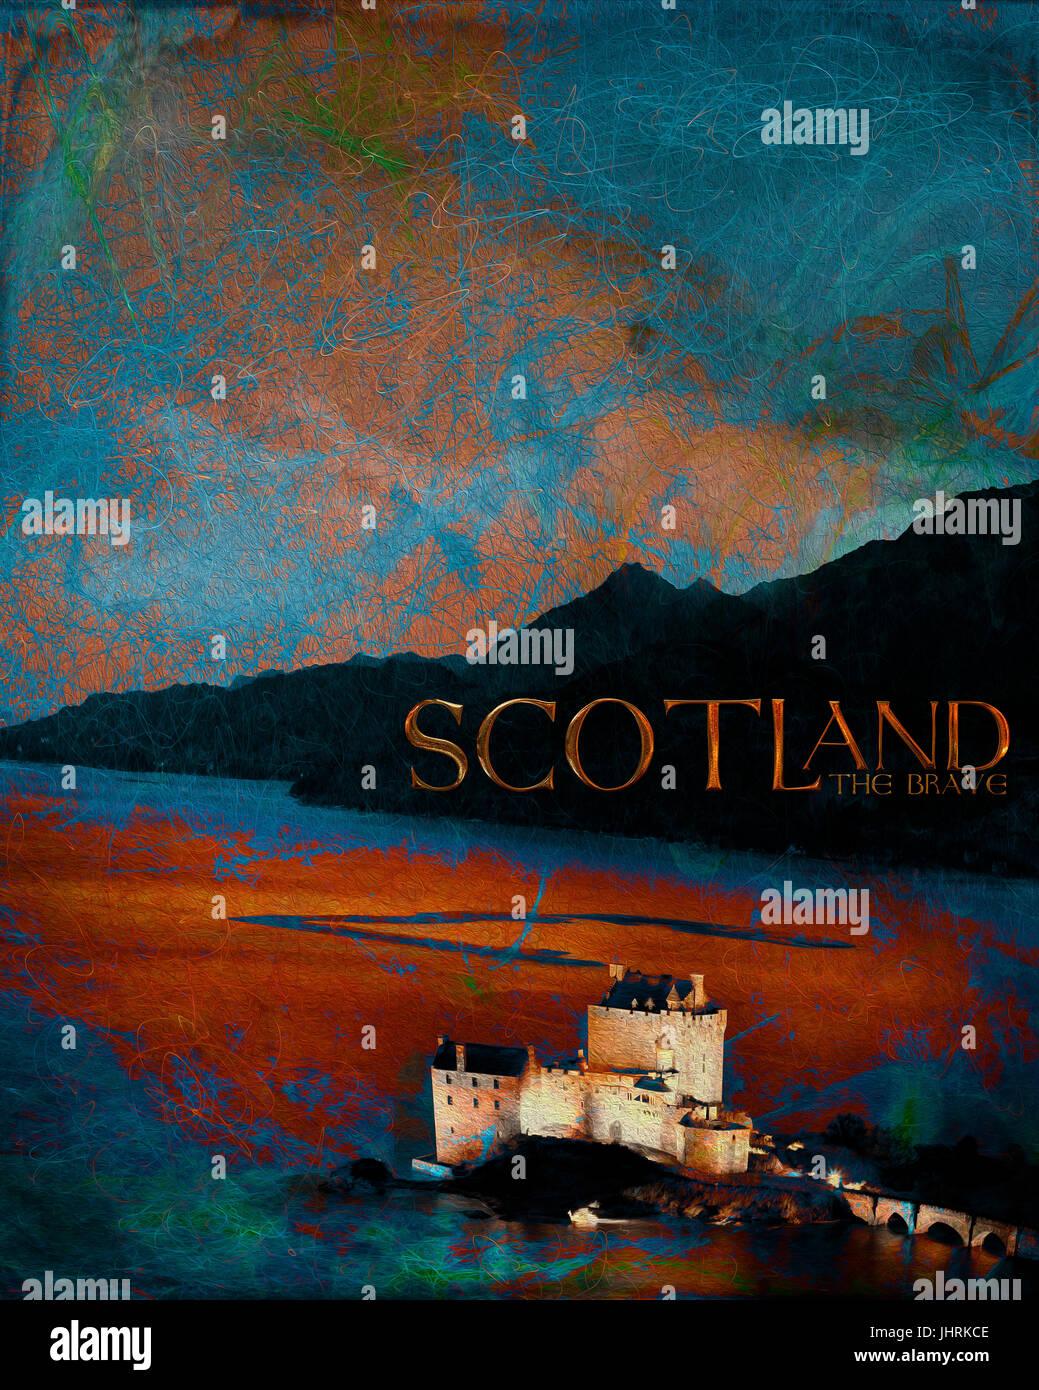 DIGITAL ART: Scotland The Brave - Stock Image